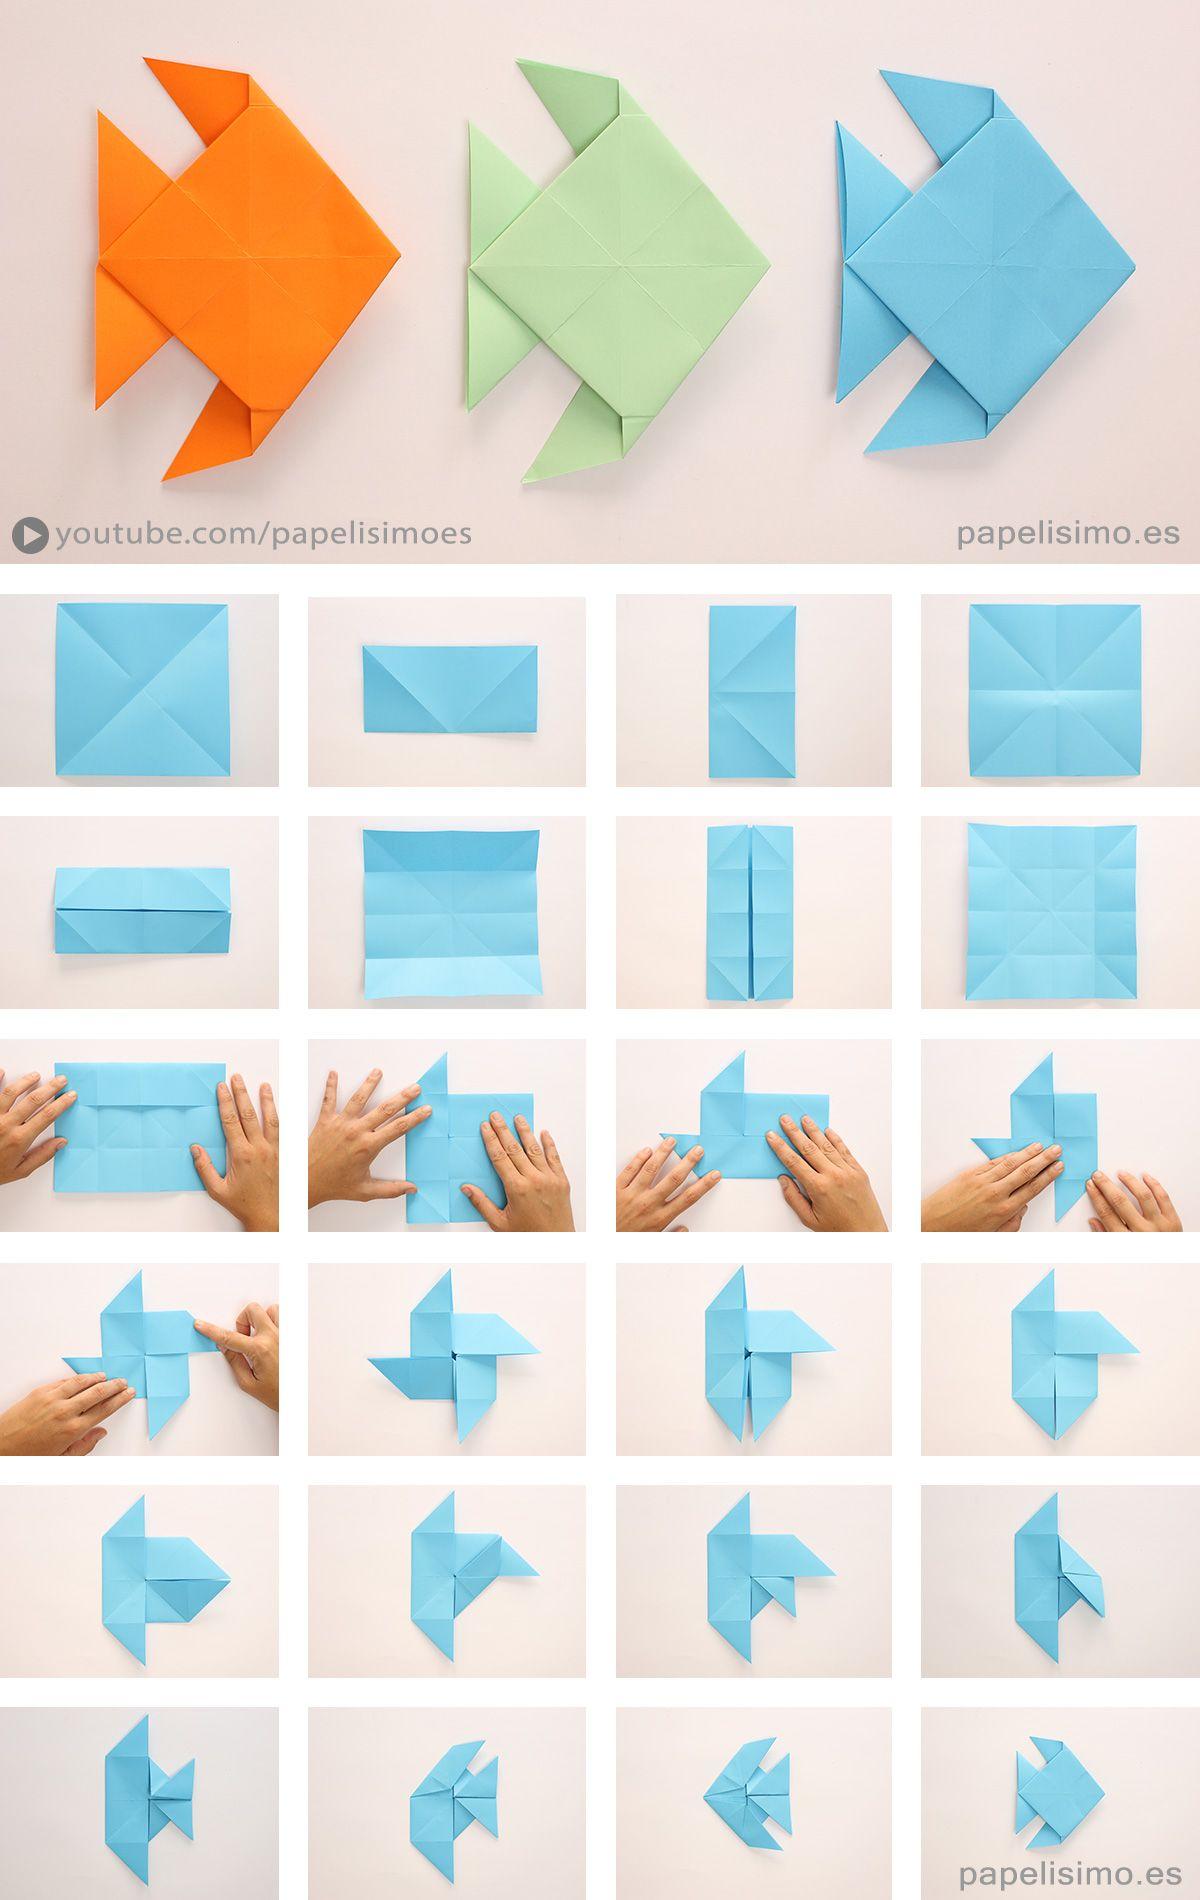 pez-de-papel-papiroflexia-origami-paper-fish | Papelisimo ... - photo#3